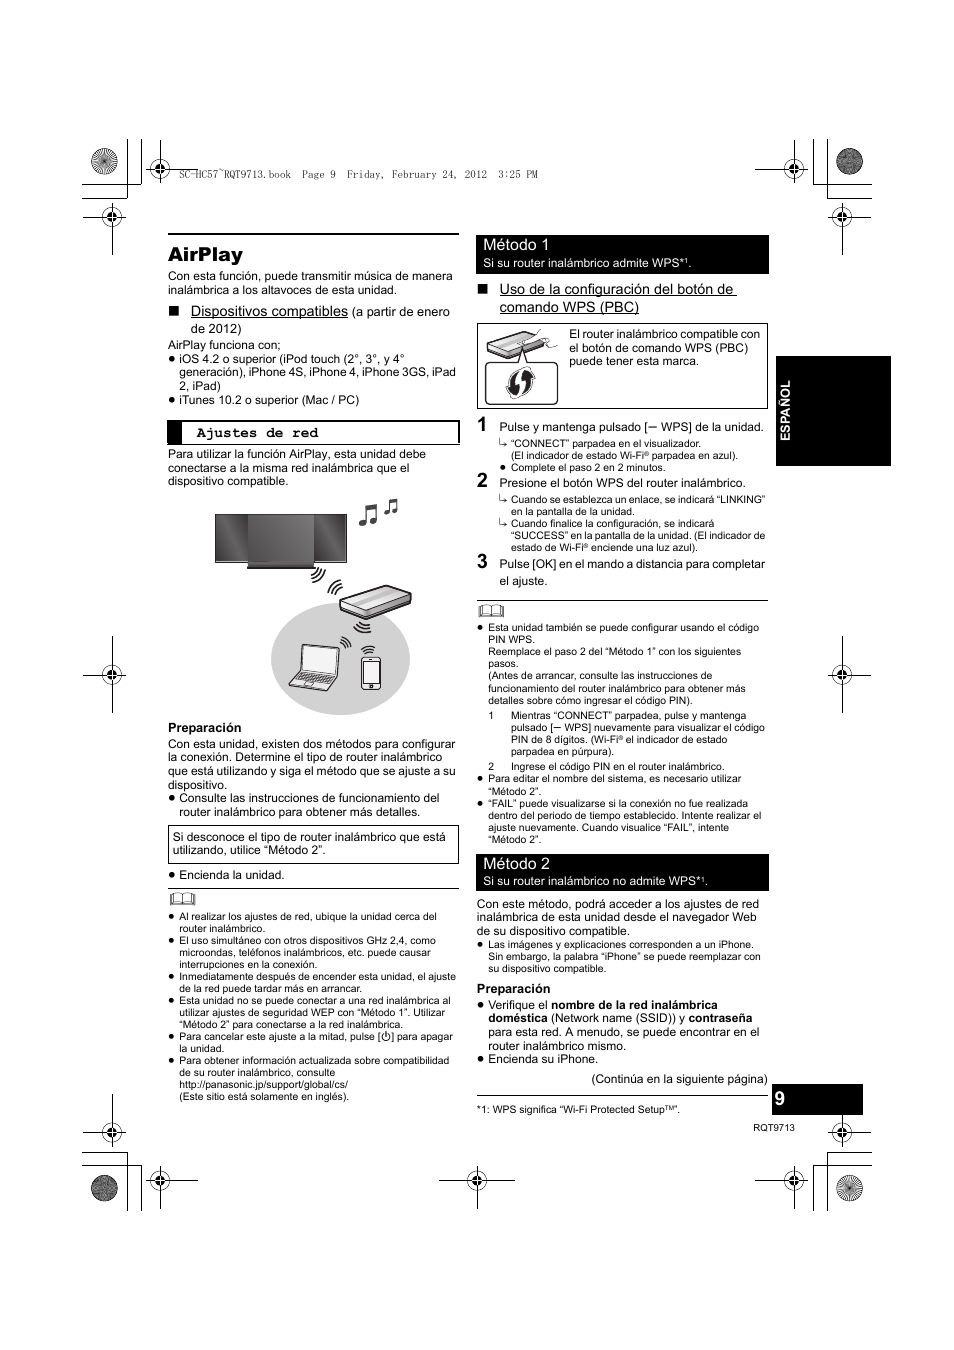 Airplay, Método 1, Método 2 | Panasonic SCHC57EG Manual del